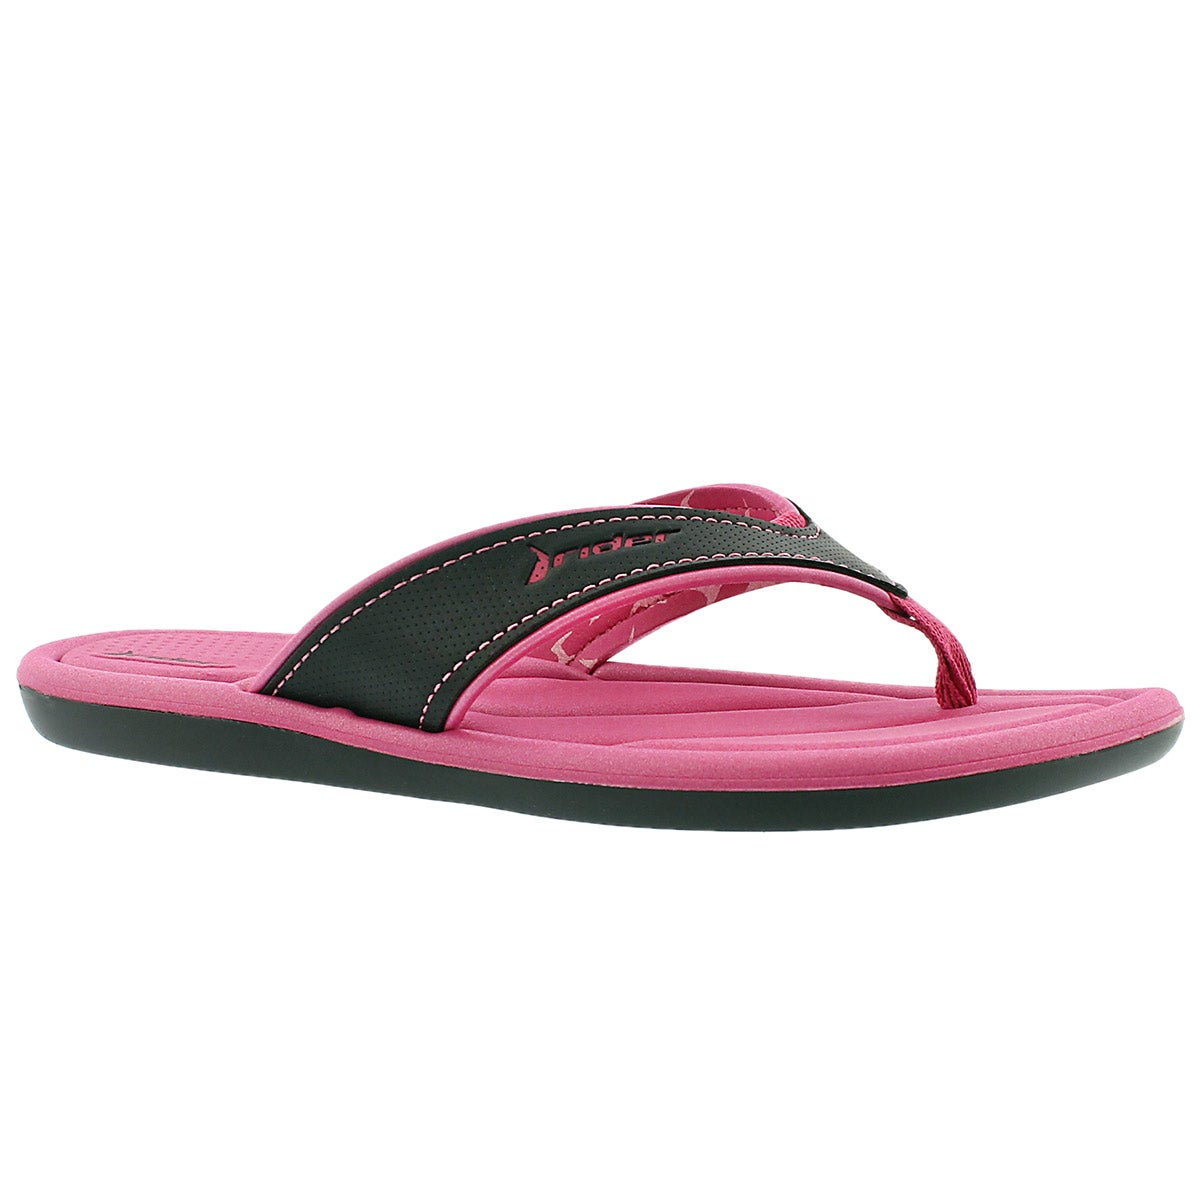 Sandale tong CLOUD III, rose, femmes